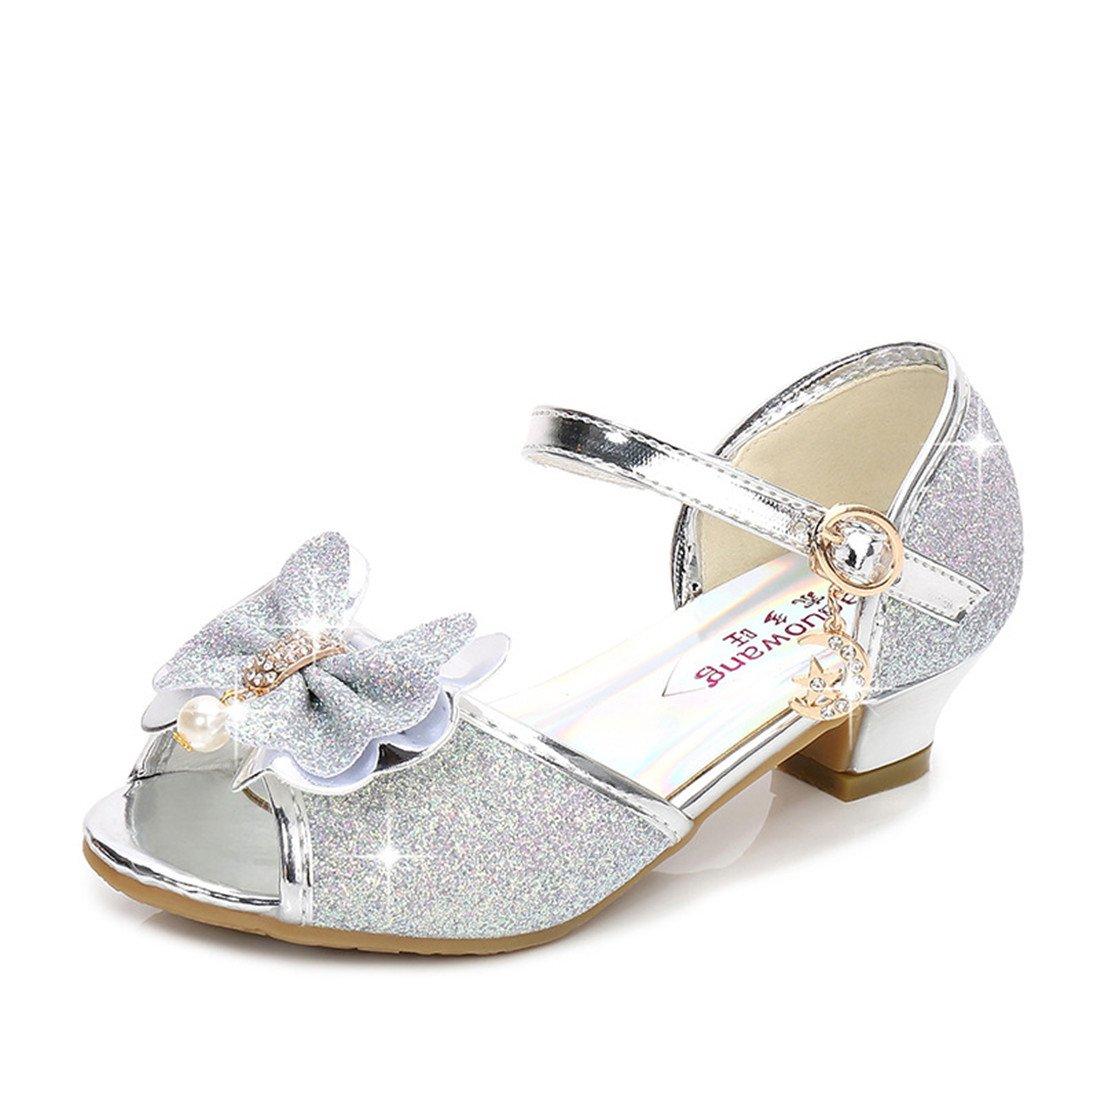 Sandals for Girls Low Heel Light Sliver Toddler Wedding Dress Shoes Size 11 Princess Sequin Little Girls Cute Rhinestone (Sliver 26)